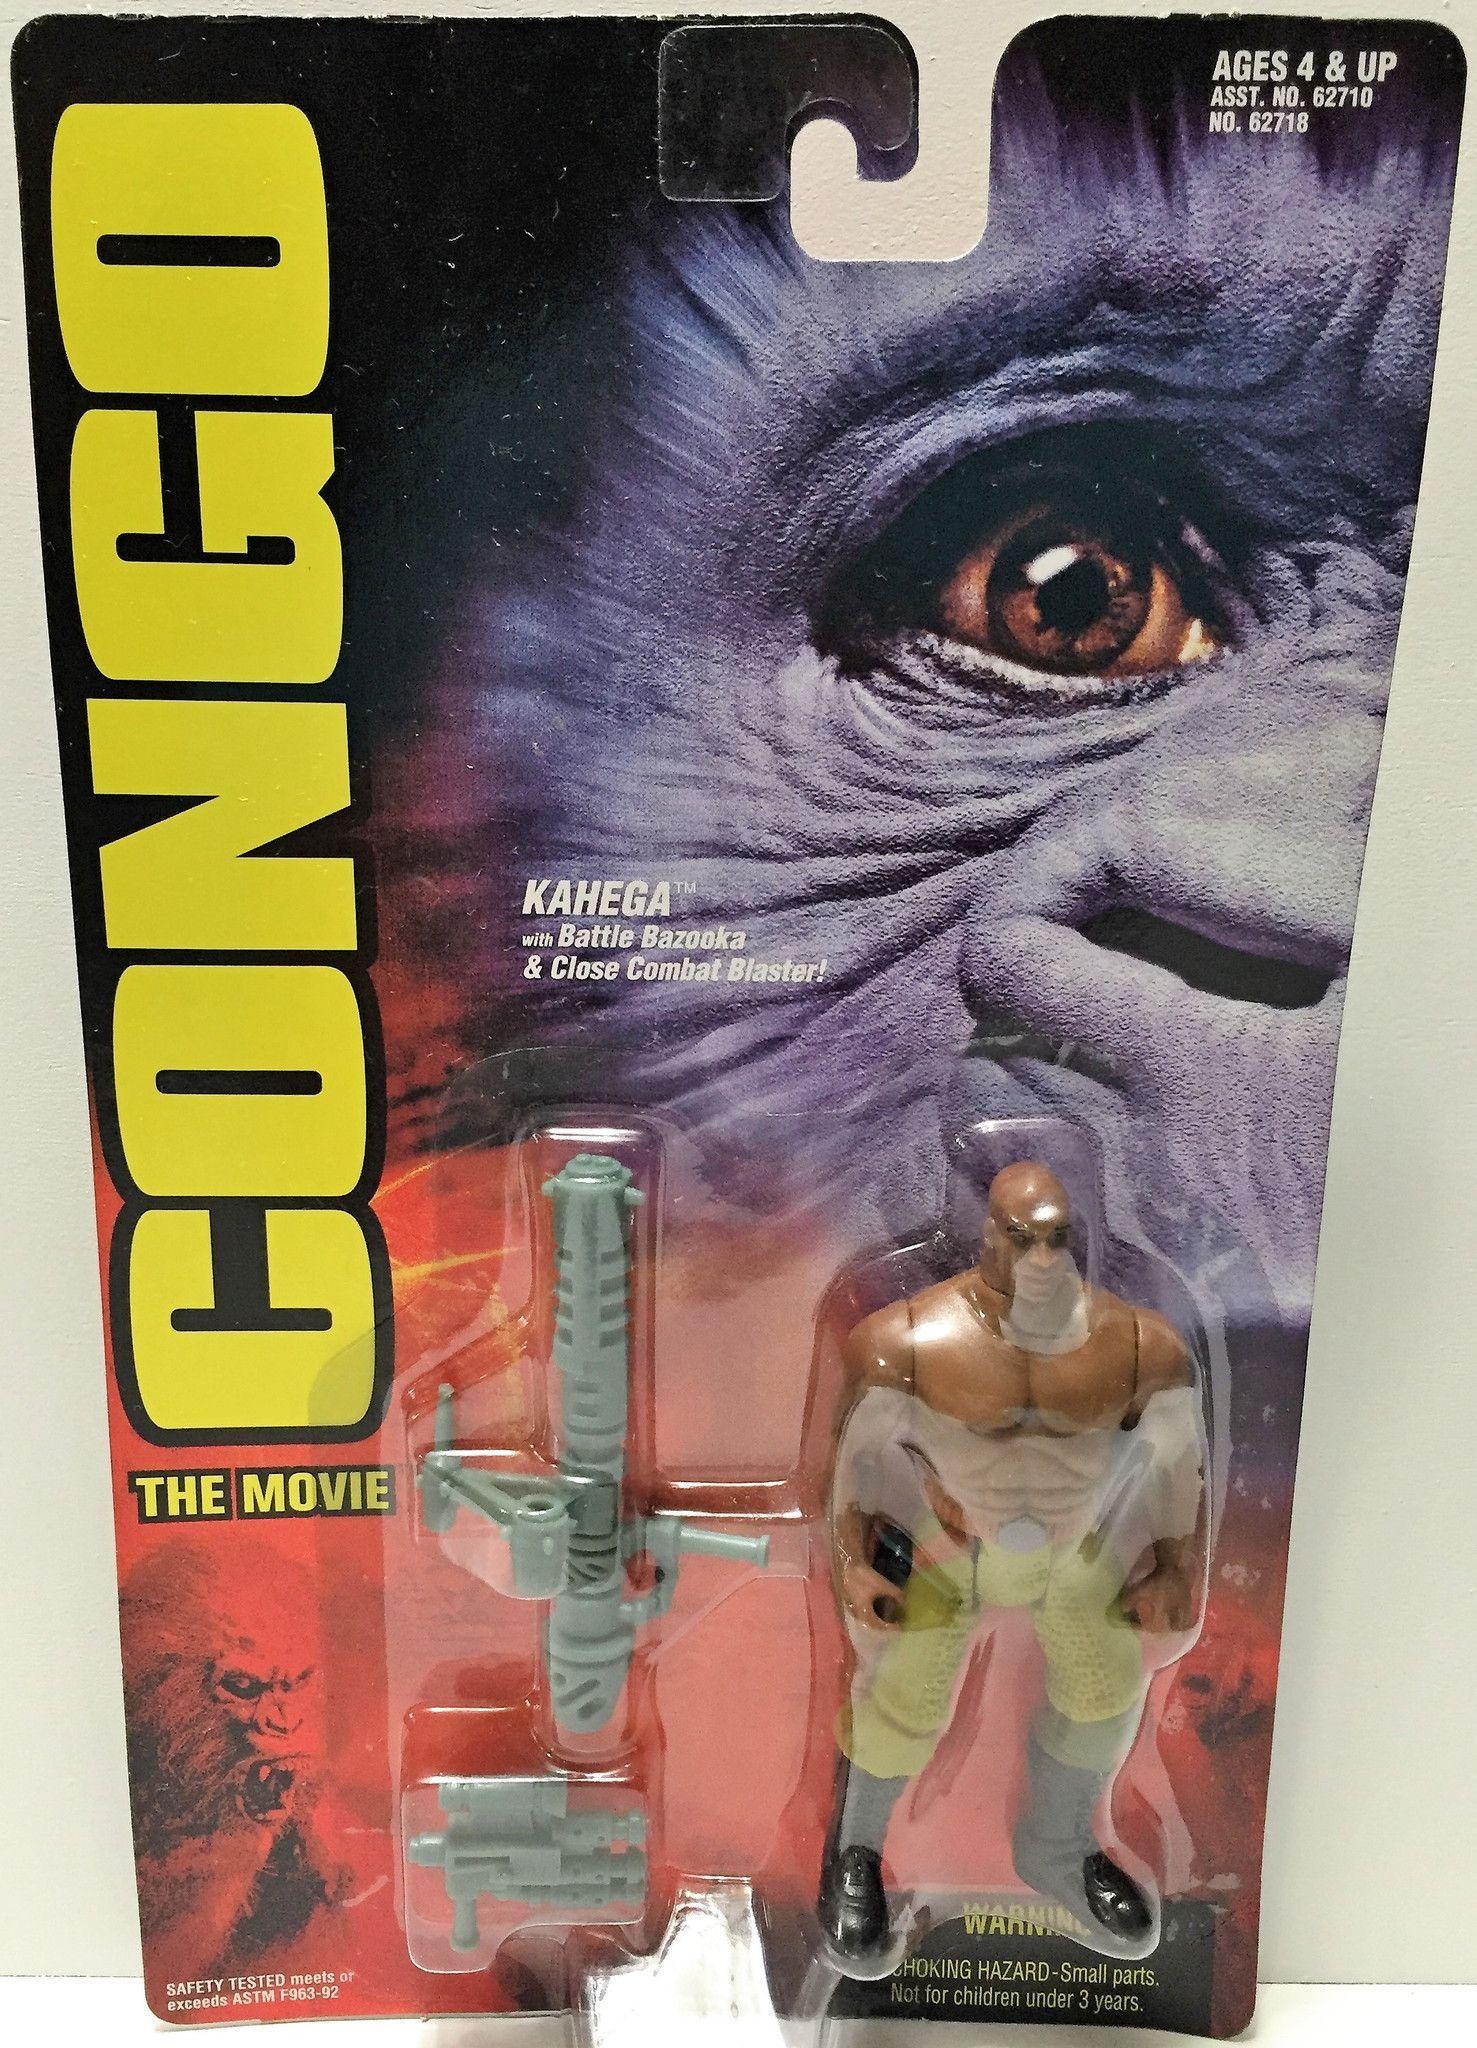 Tas034181 1995 kenner congo the movie collectible